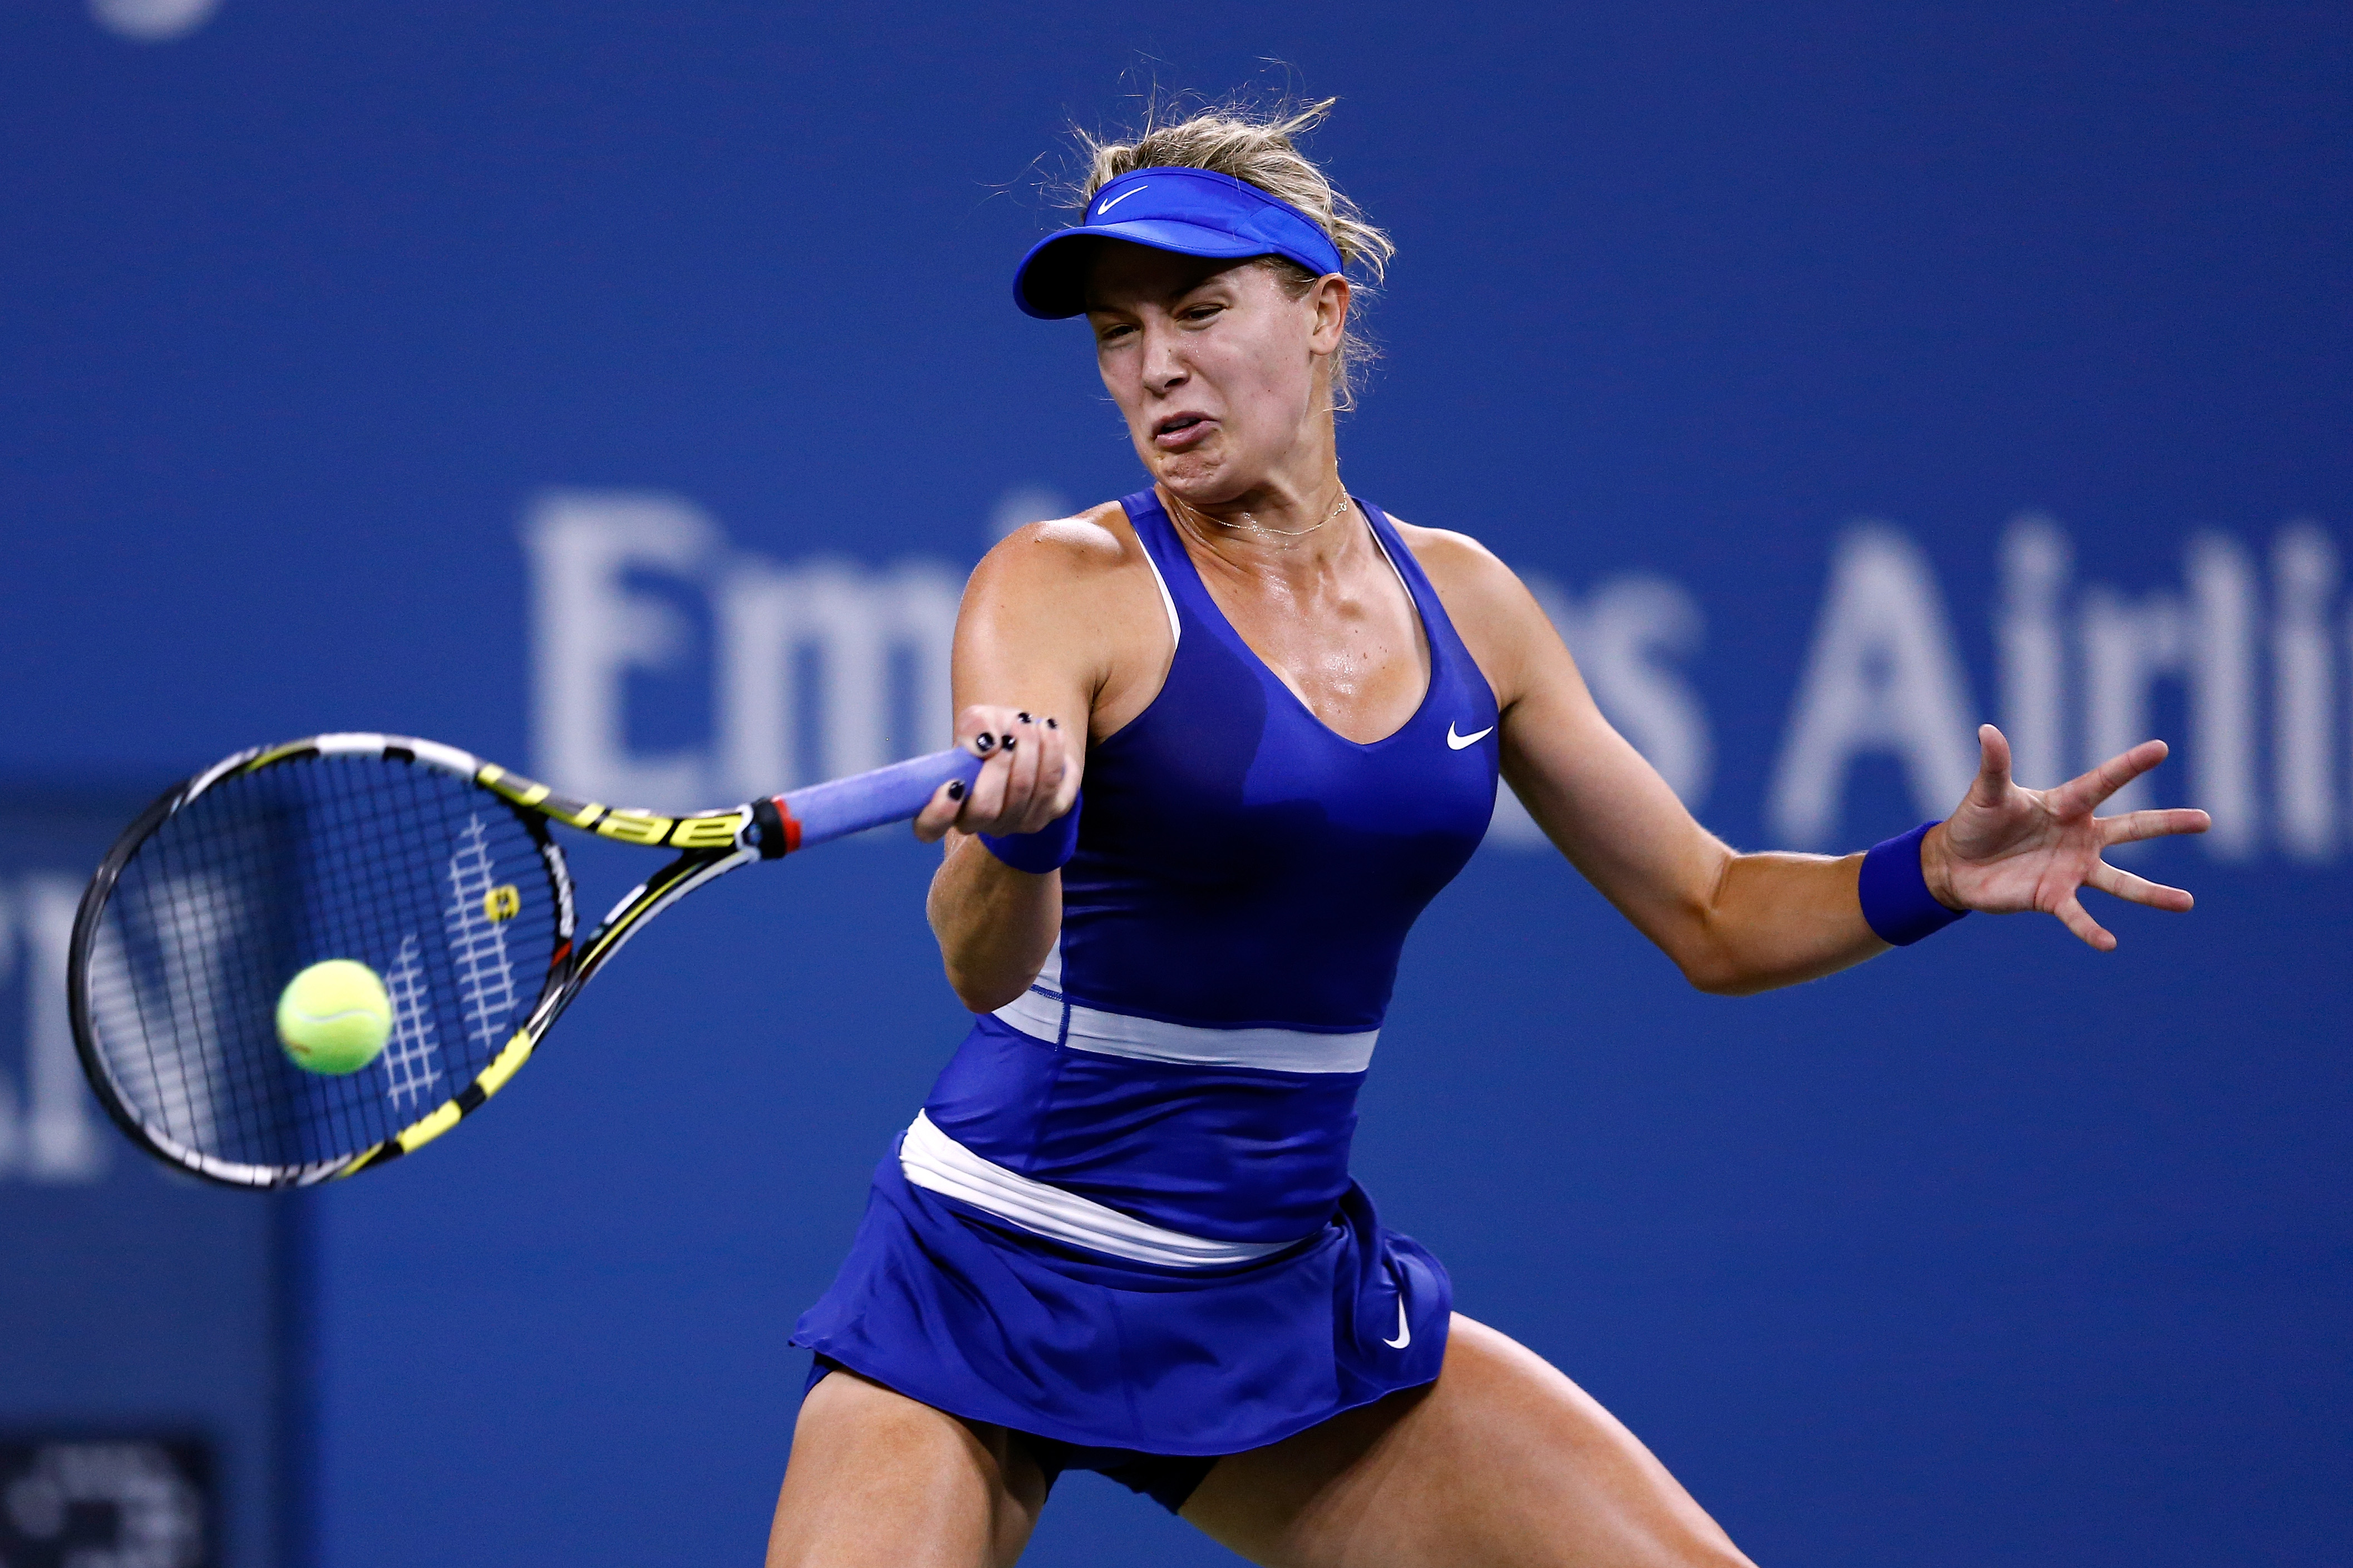 Bouchard's little blue Nike dress was simple yet distinctive.